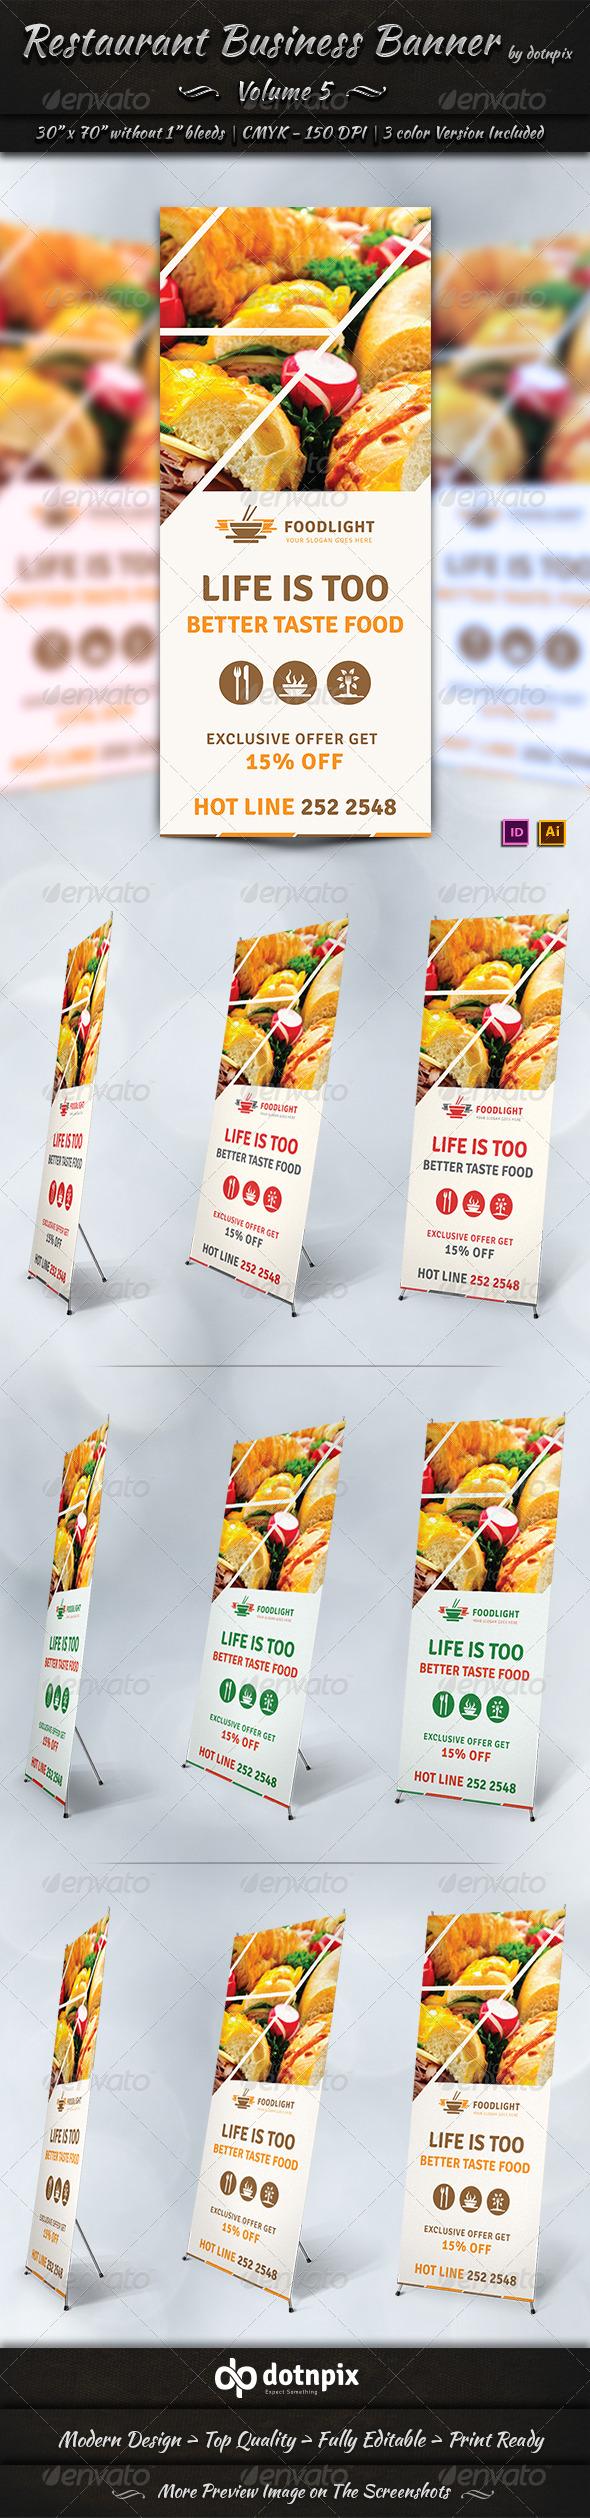 GraphicRiver Restaurant Business Banner Volume 5 7588500